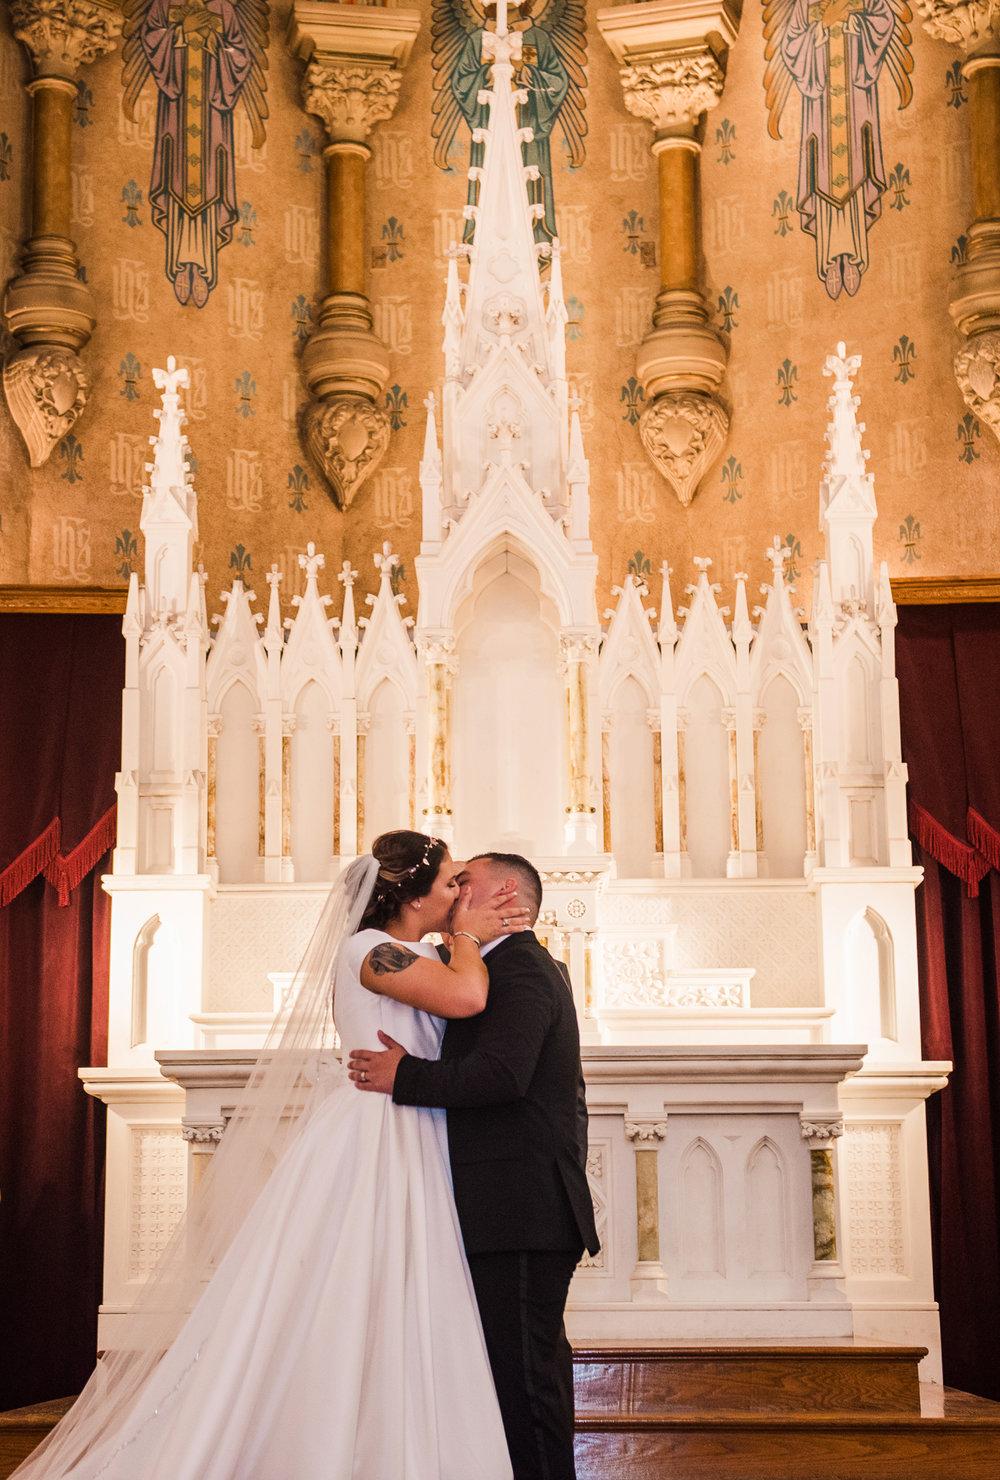 JILLSTUDIO_Blue_Barn_Cidery_Rochester_Wedding_Rochester_NY_Photographer_DSC_8581.jpg